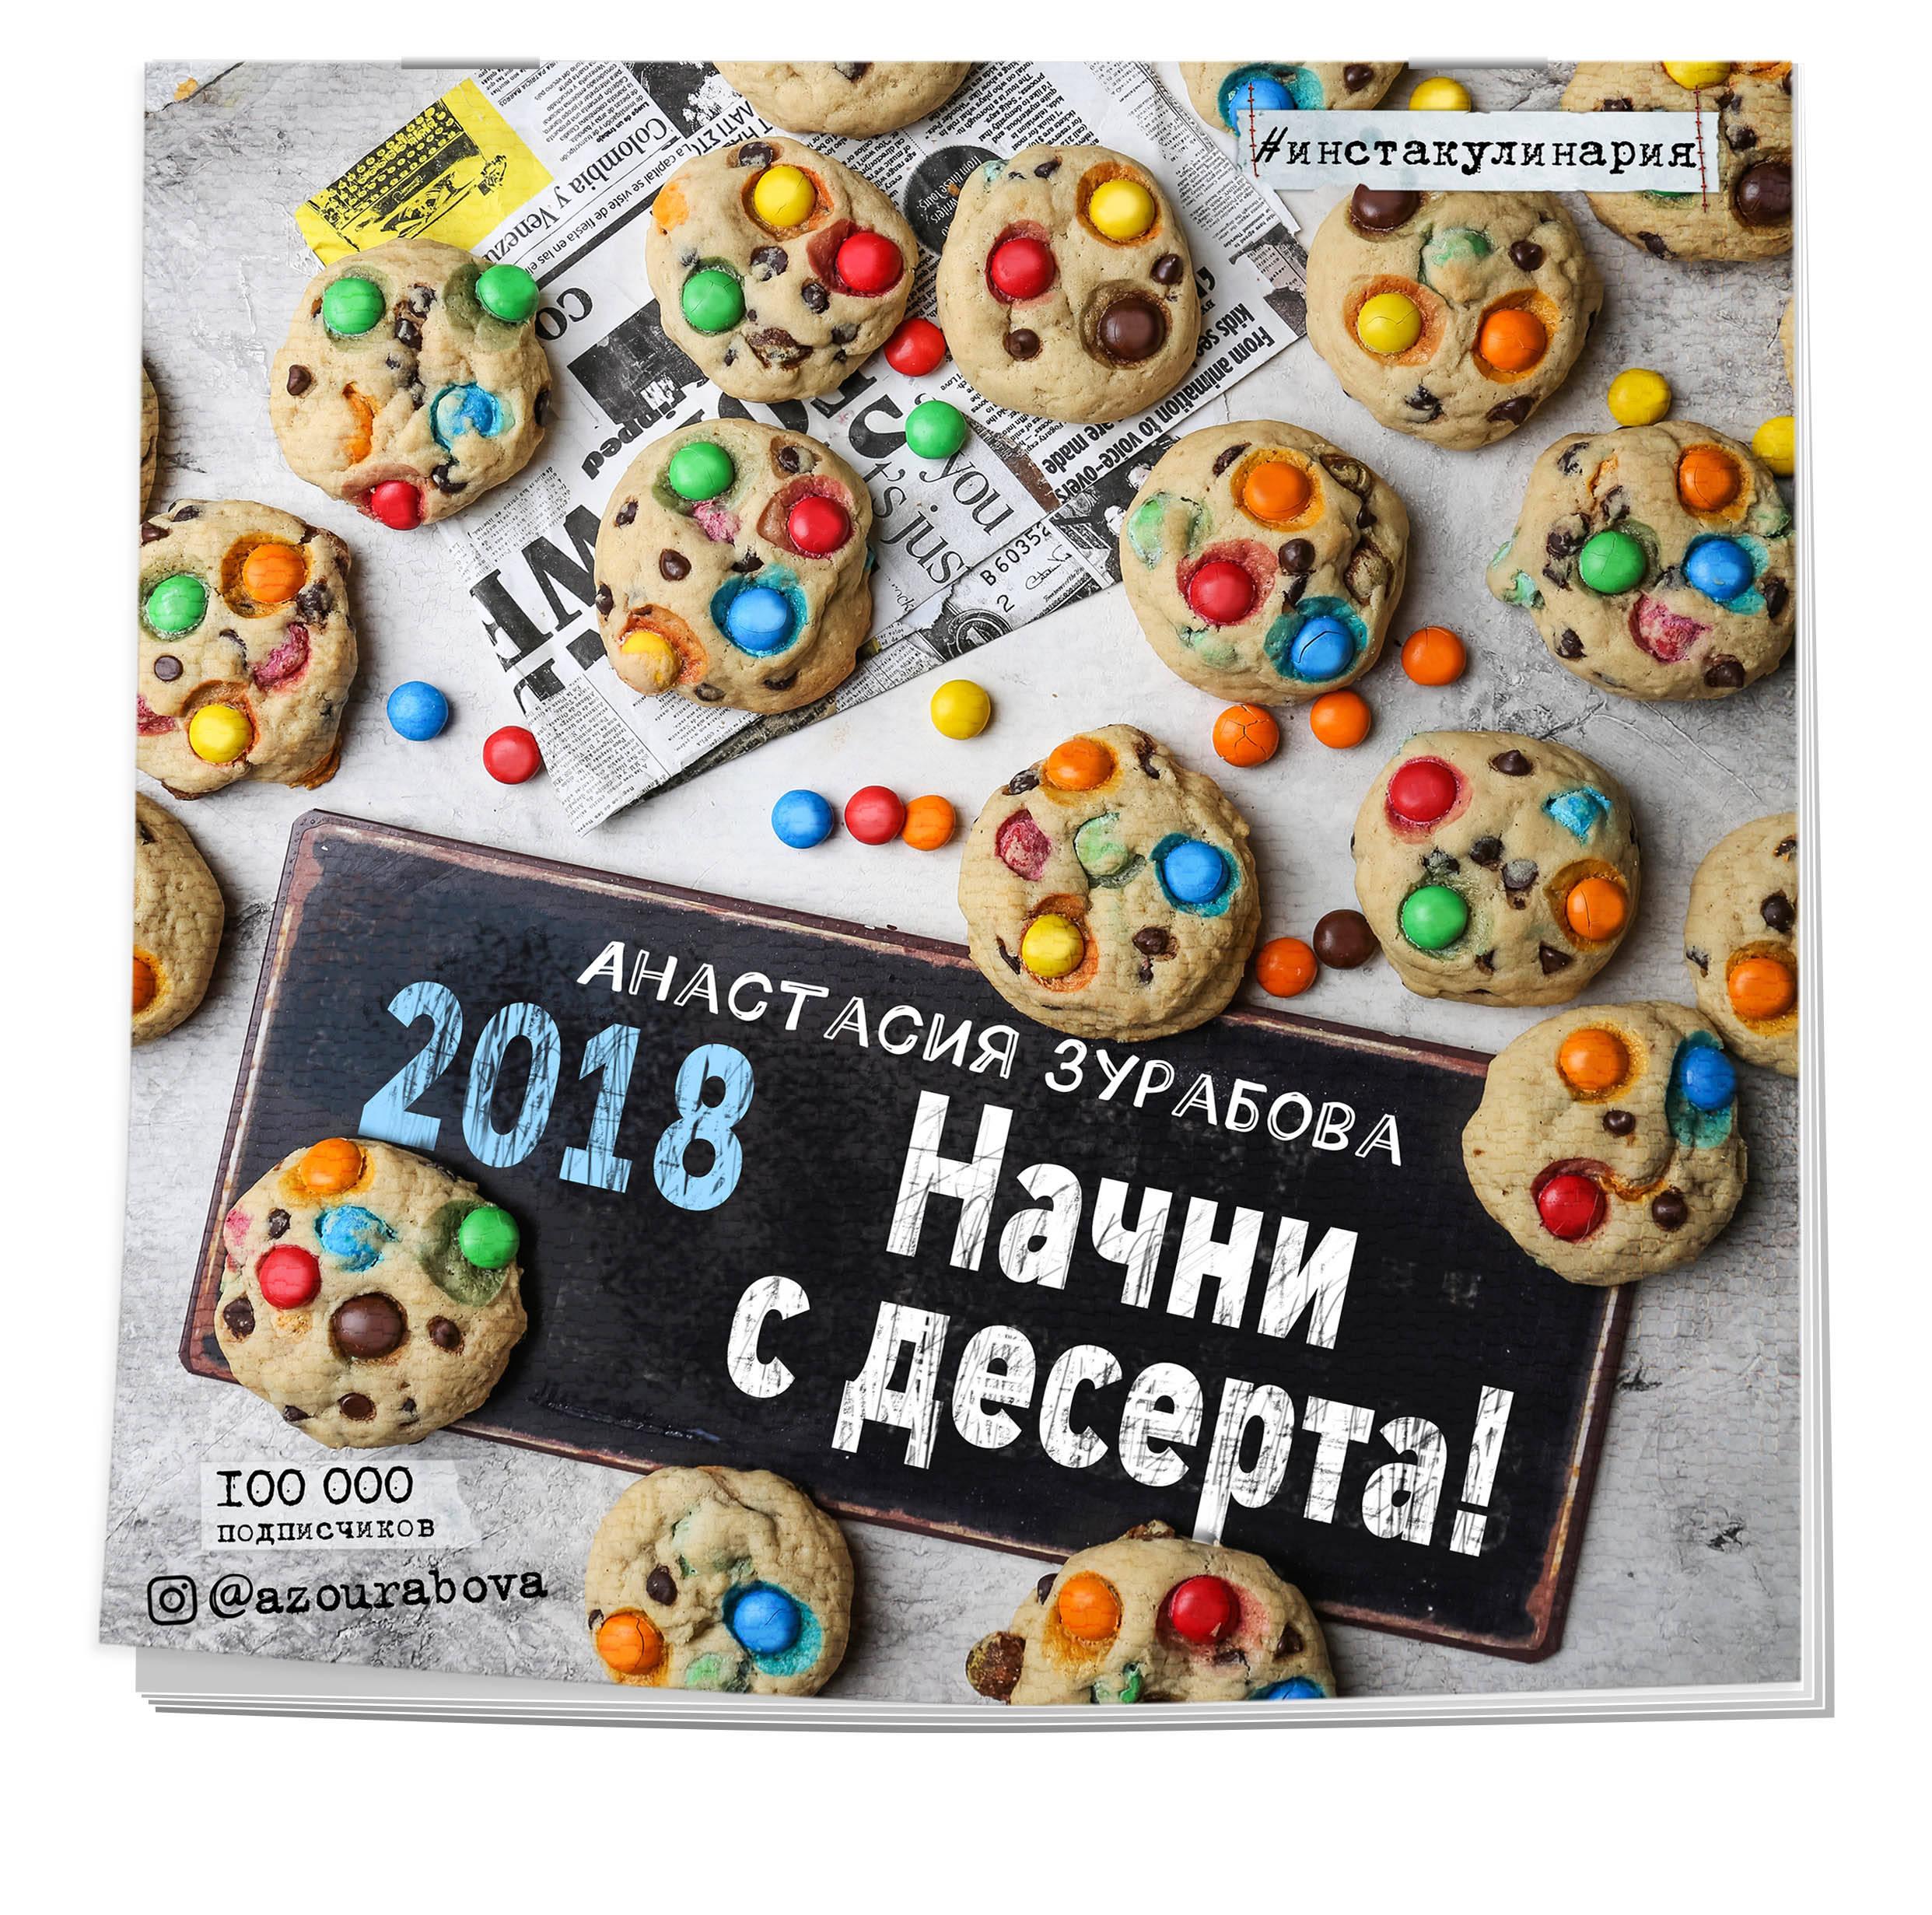 Зурабова А.М. Начни с десерта! Календарь настенный на 2018 год